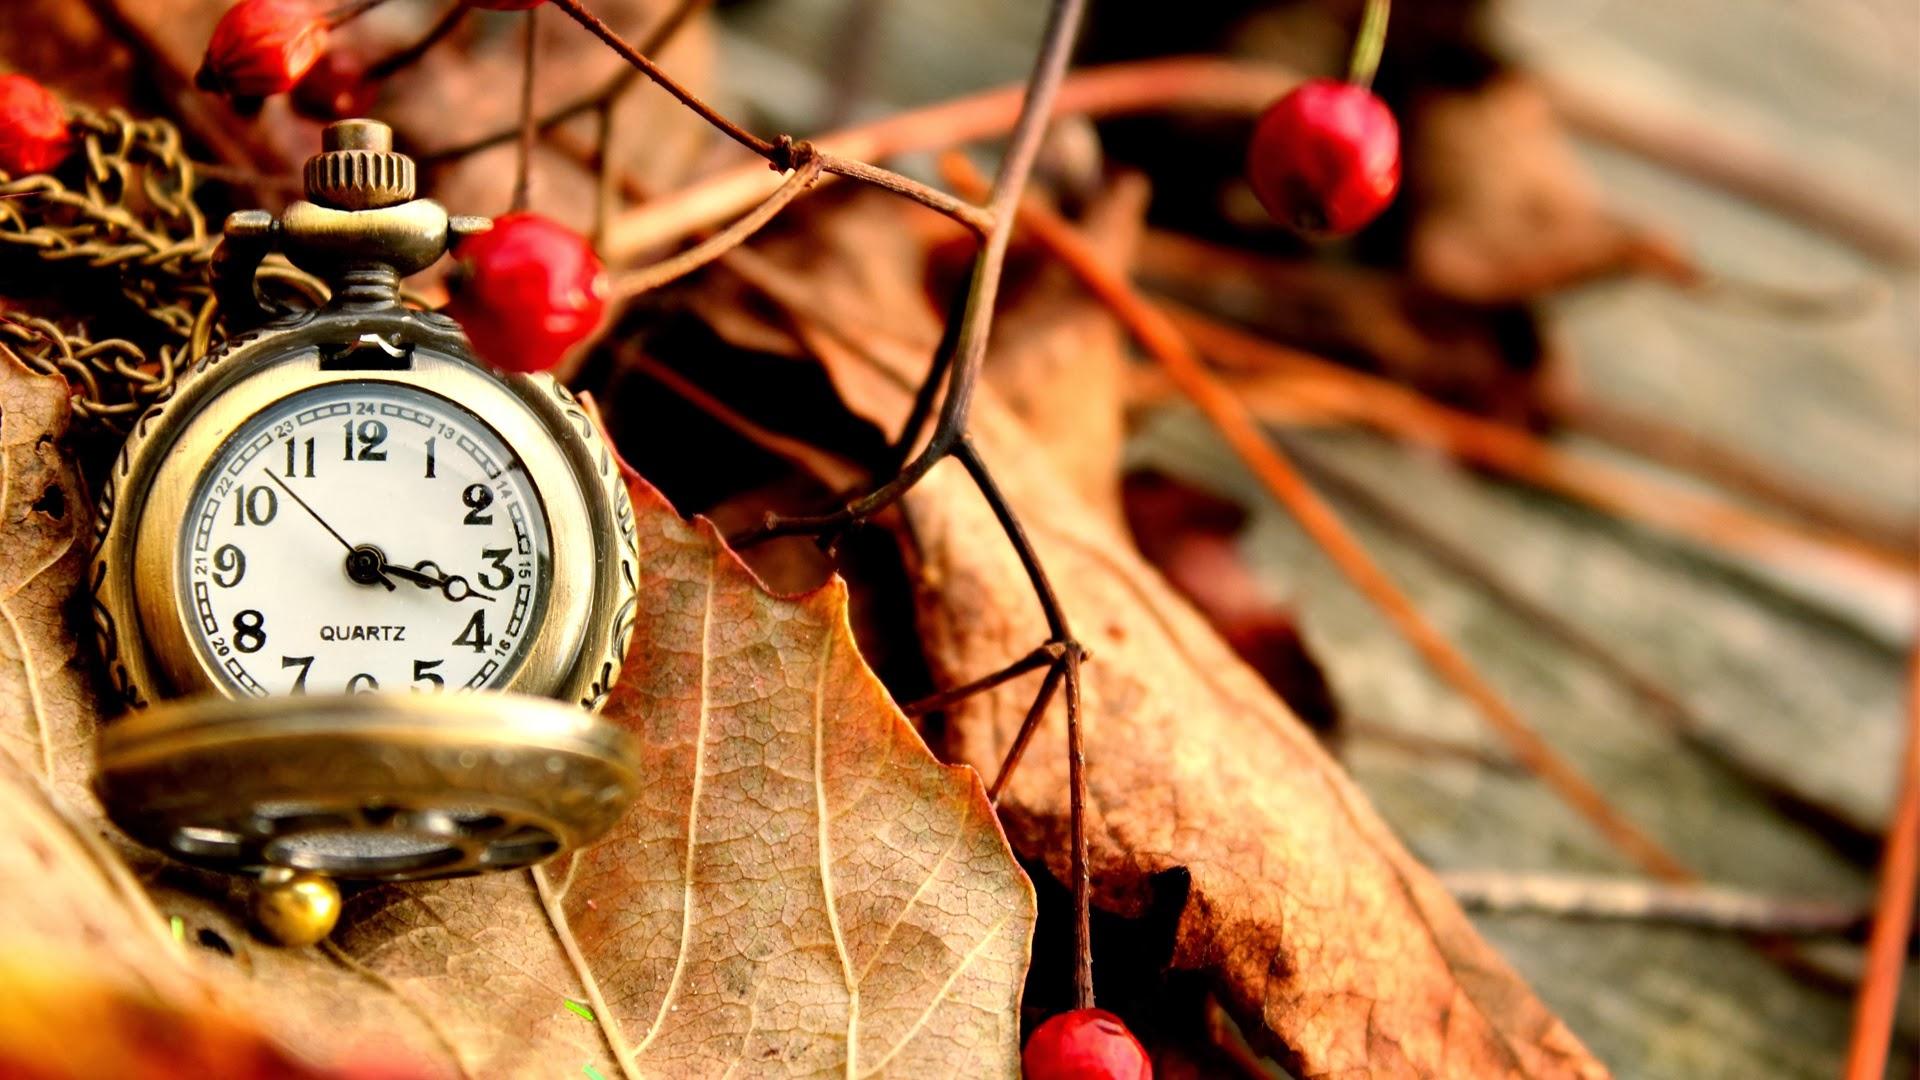 Autumn Pocket Watch Full HD Desktop Wallpapers 1080p 1920x1080